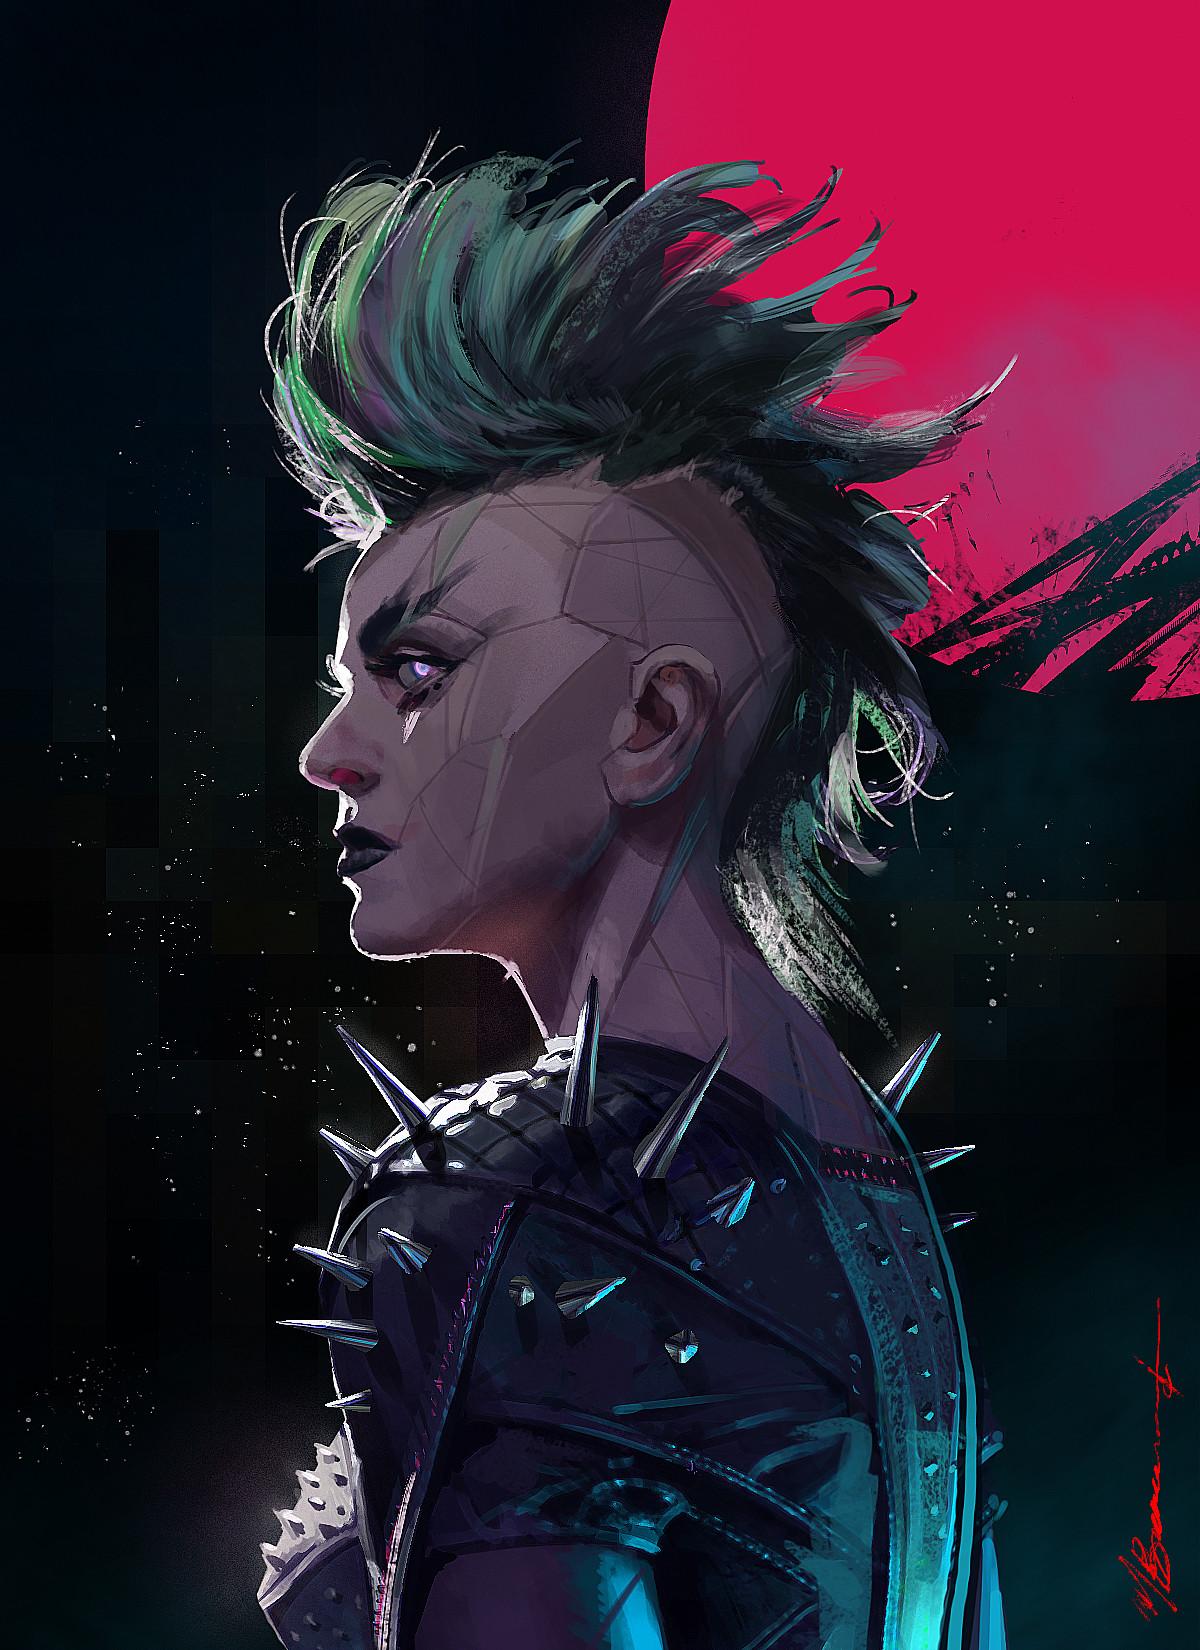 Michael Broussard Bionic Punk